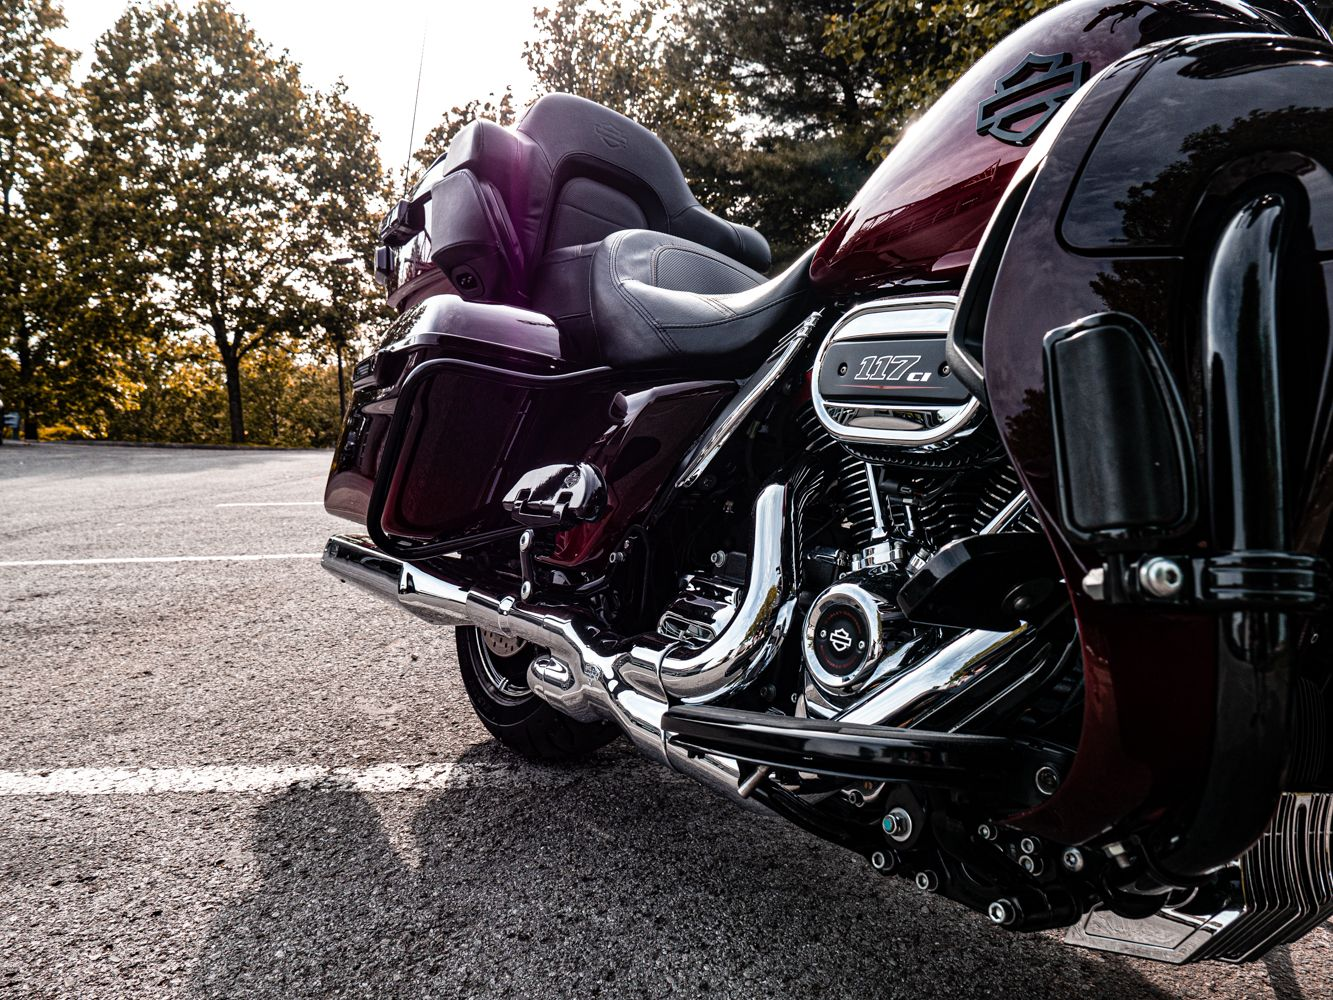 Pre-Owned 2018 Harley-Davidson CVO Limited